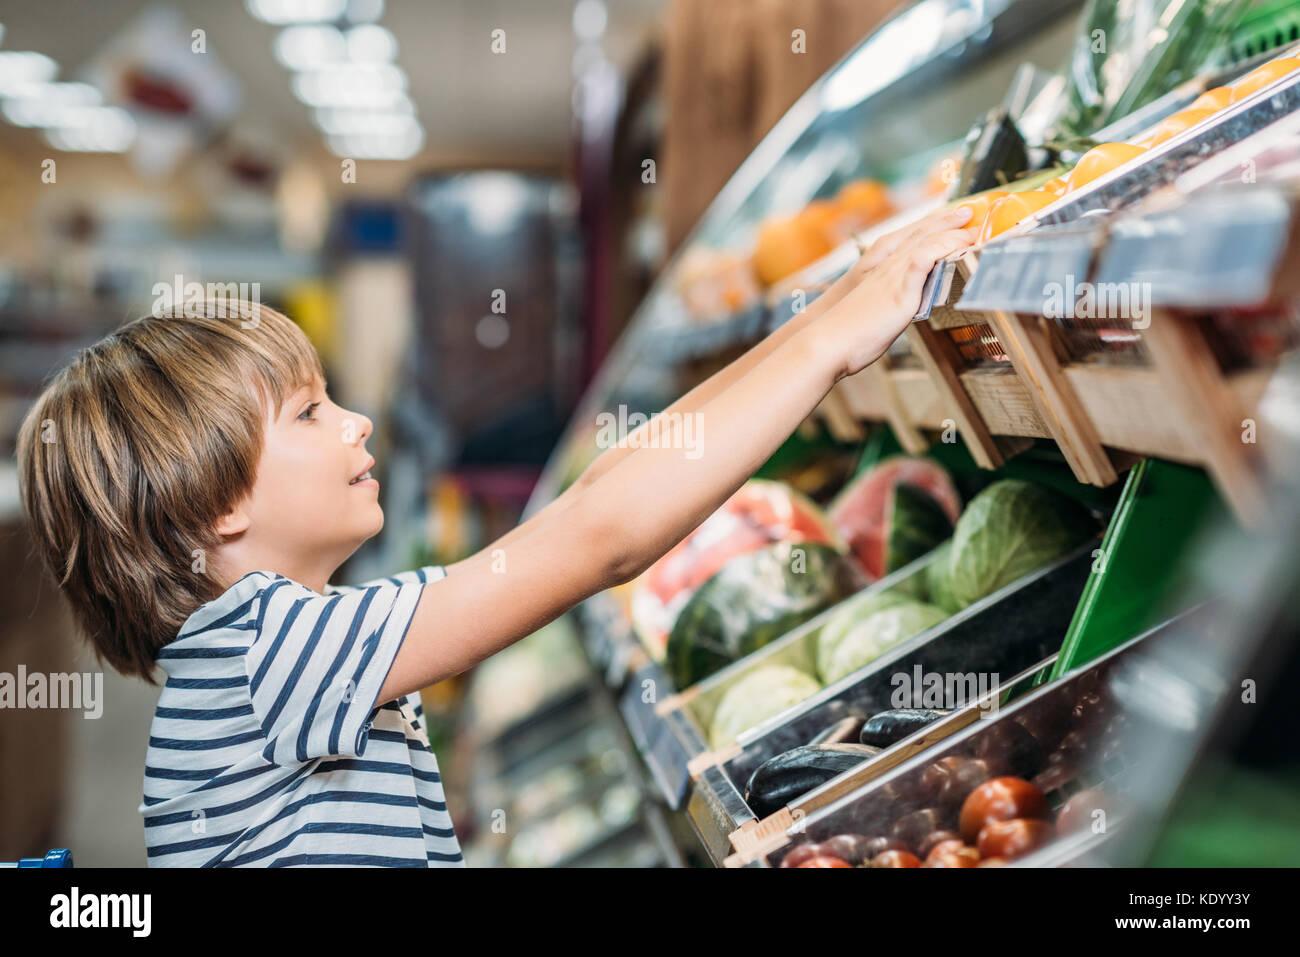 Boy escolhendo alimentos na mercearia Foto de Stock